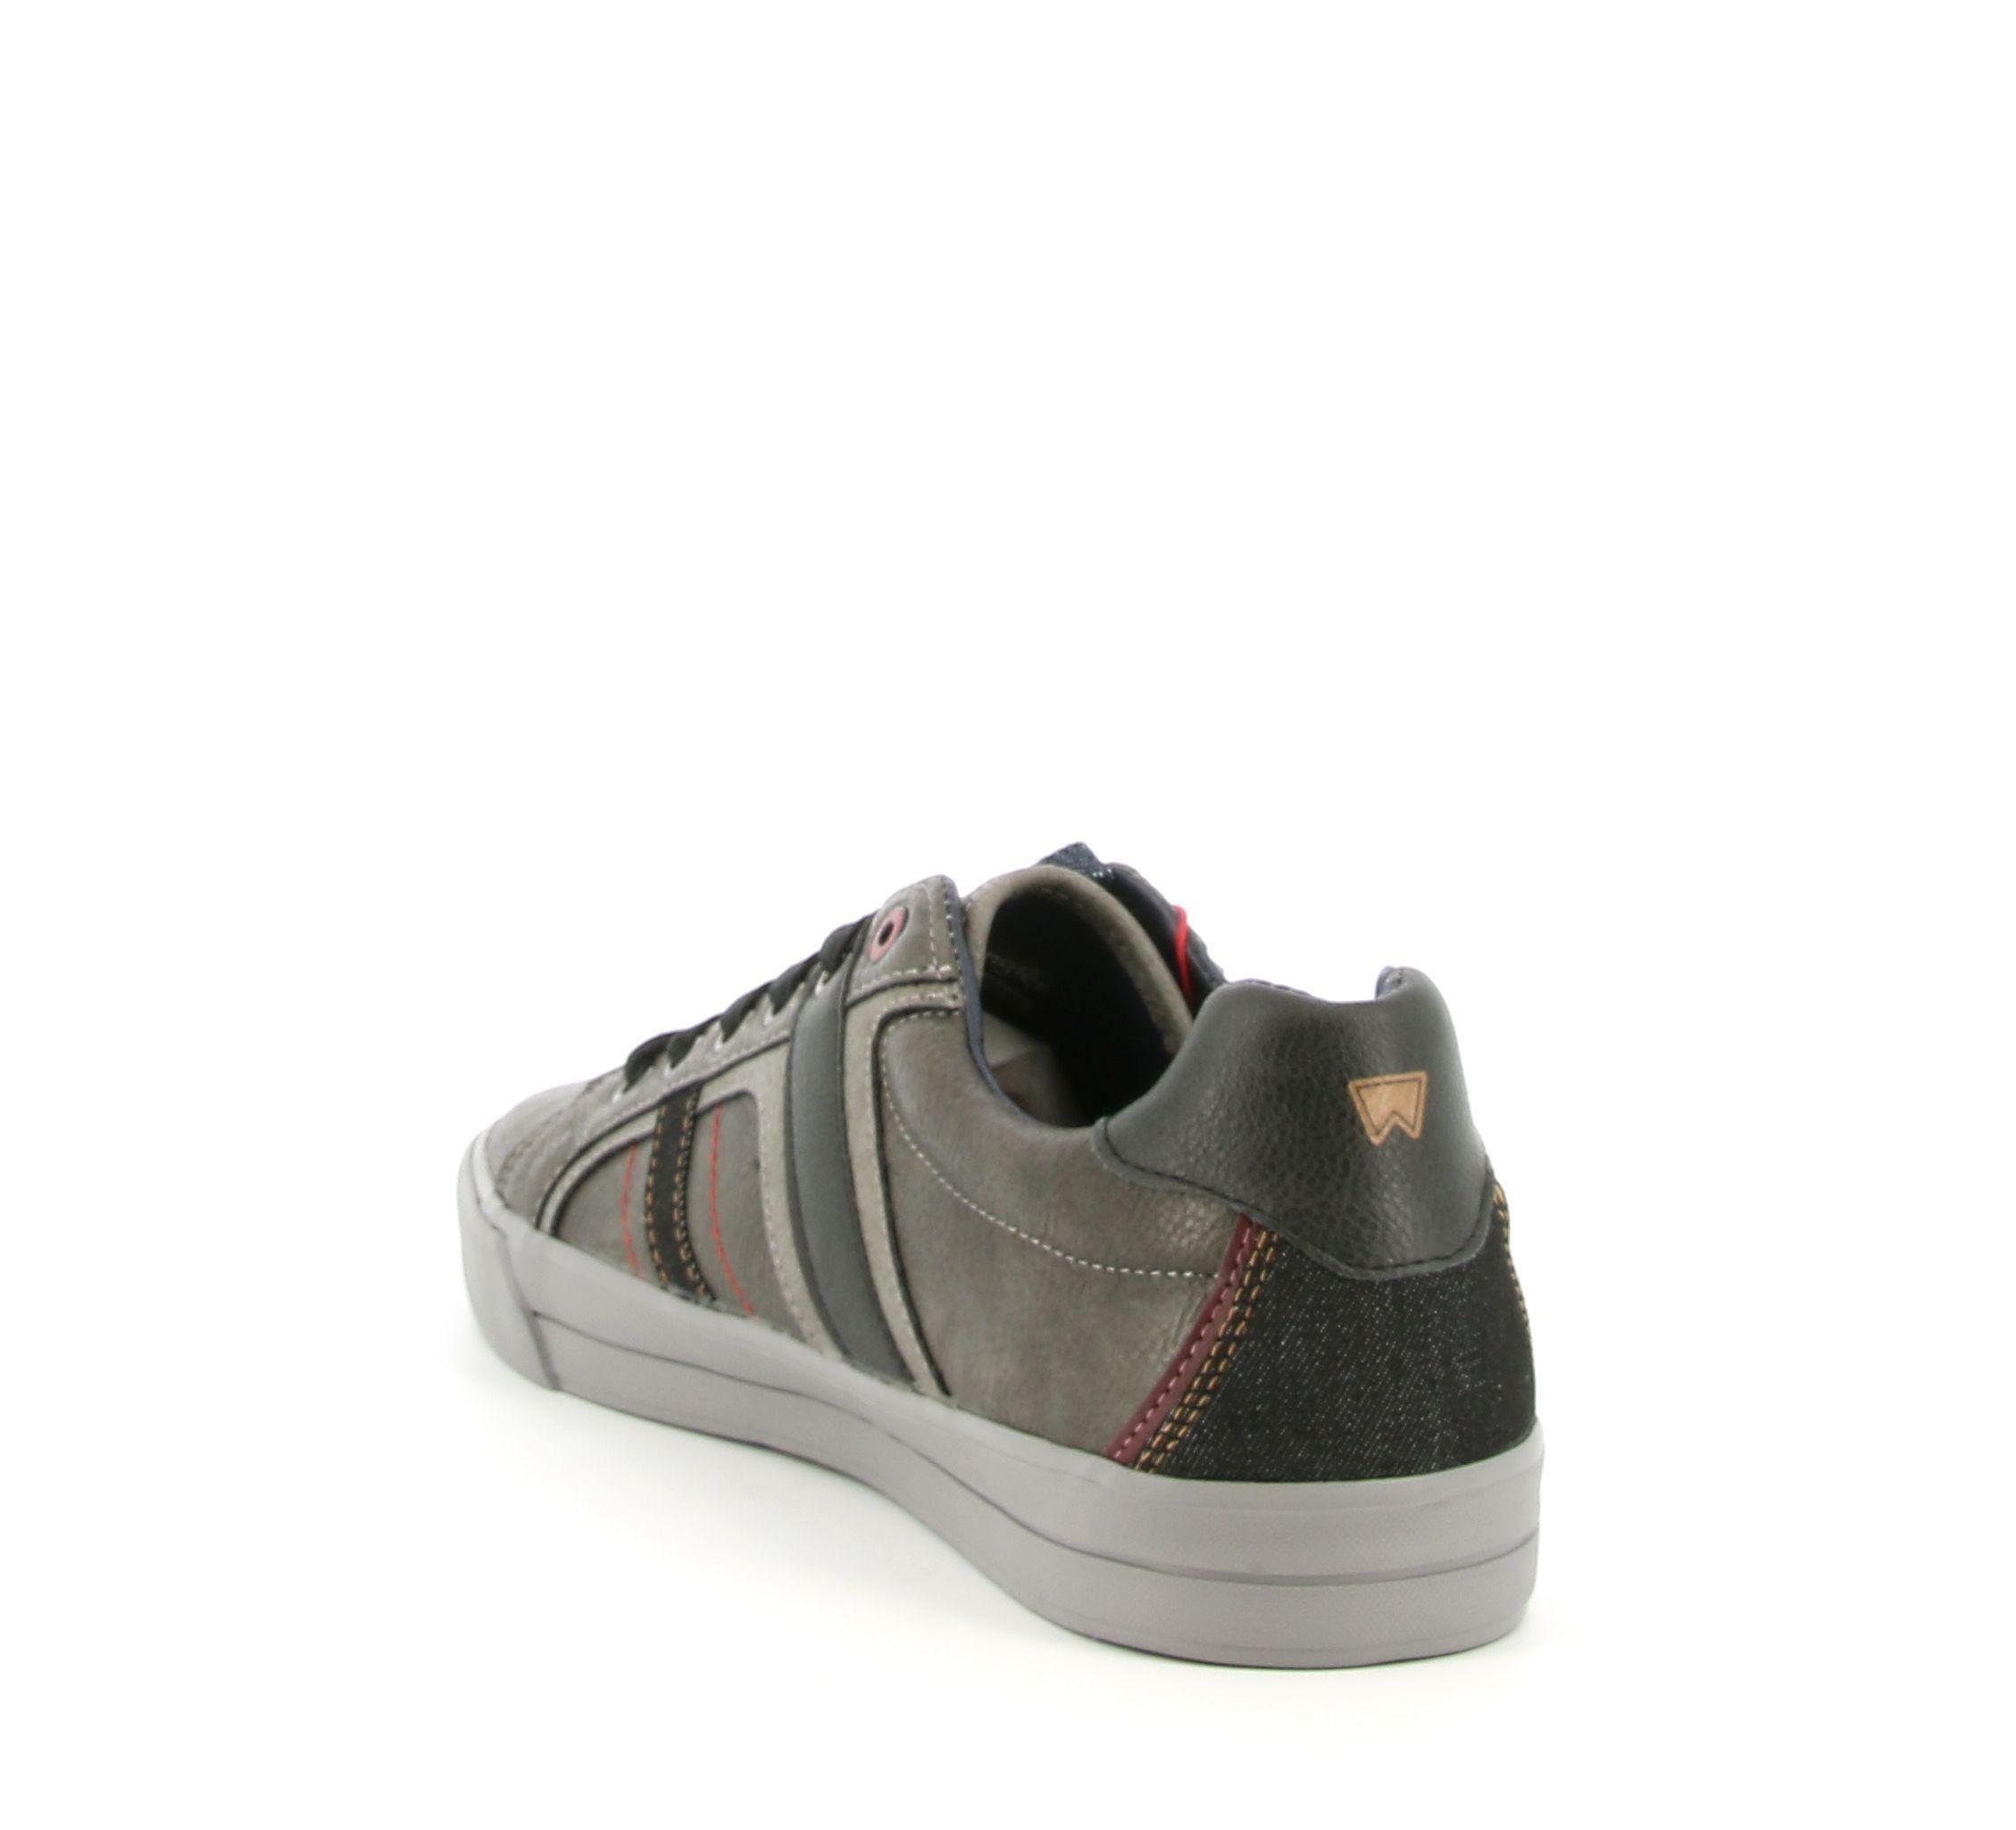 wrangler wrangler sneakers pacific derby wm02131a bassa da uomo grigio